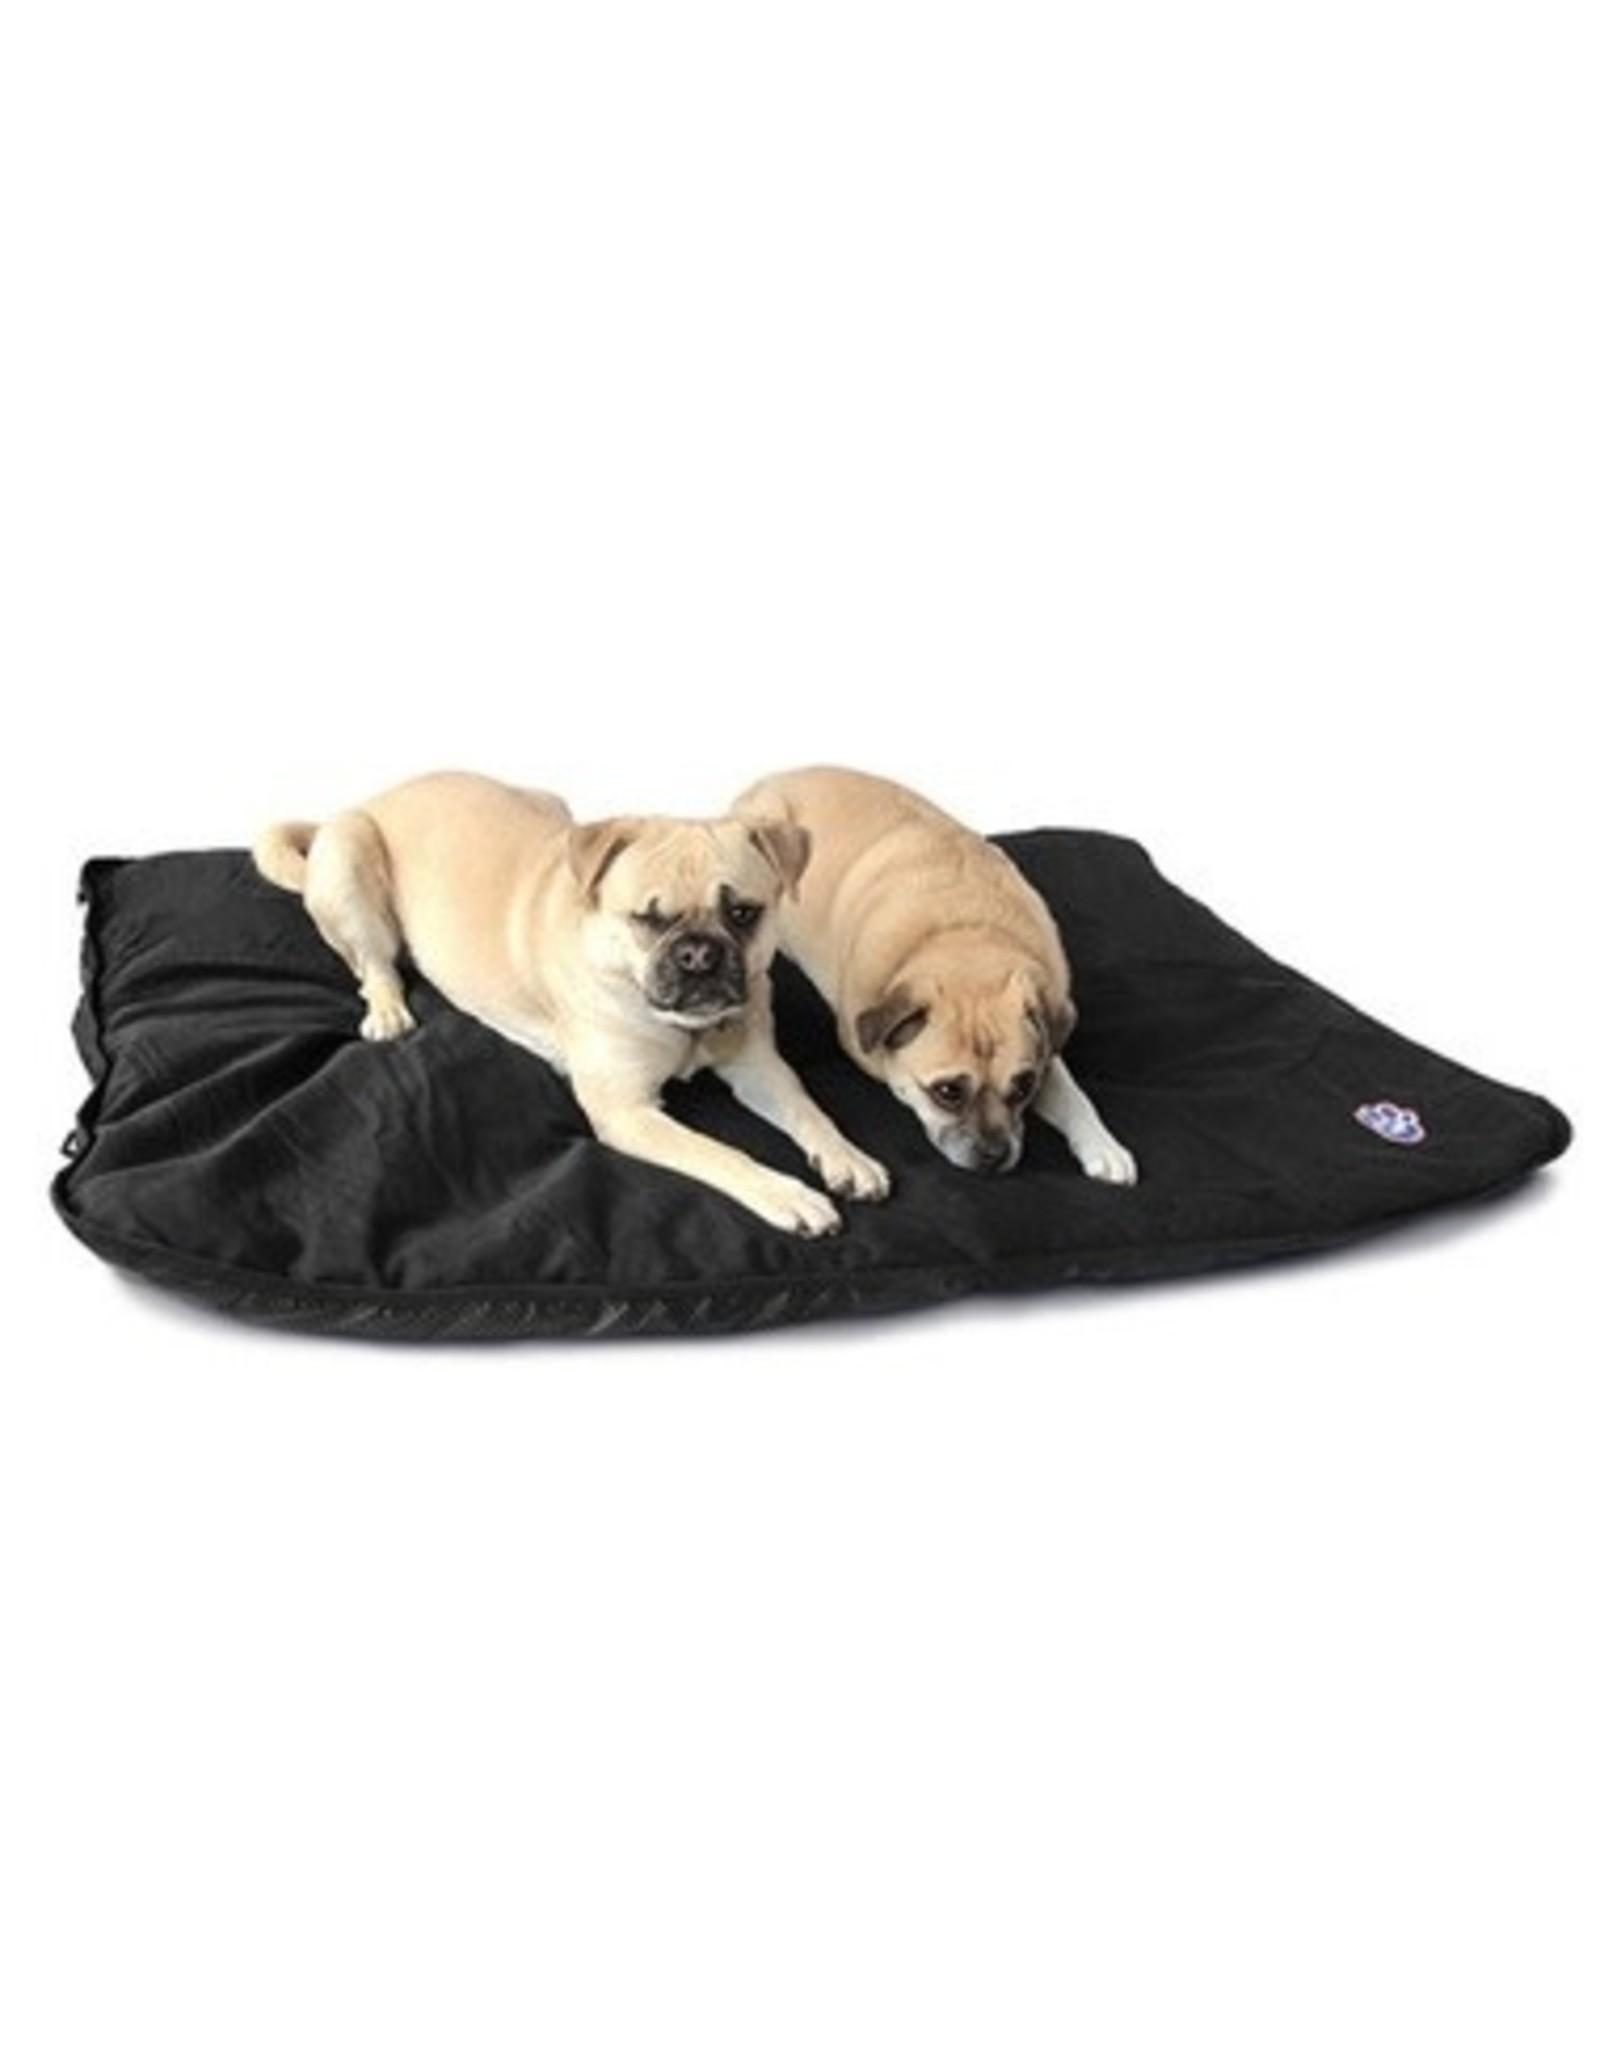 Canada Pooch Canada Pooch Rugged Rest Travel Bed Black LRG